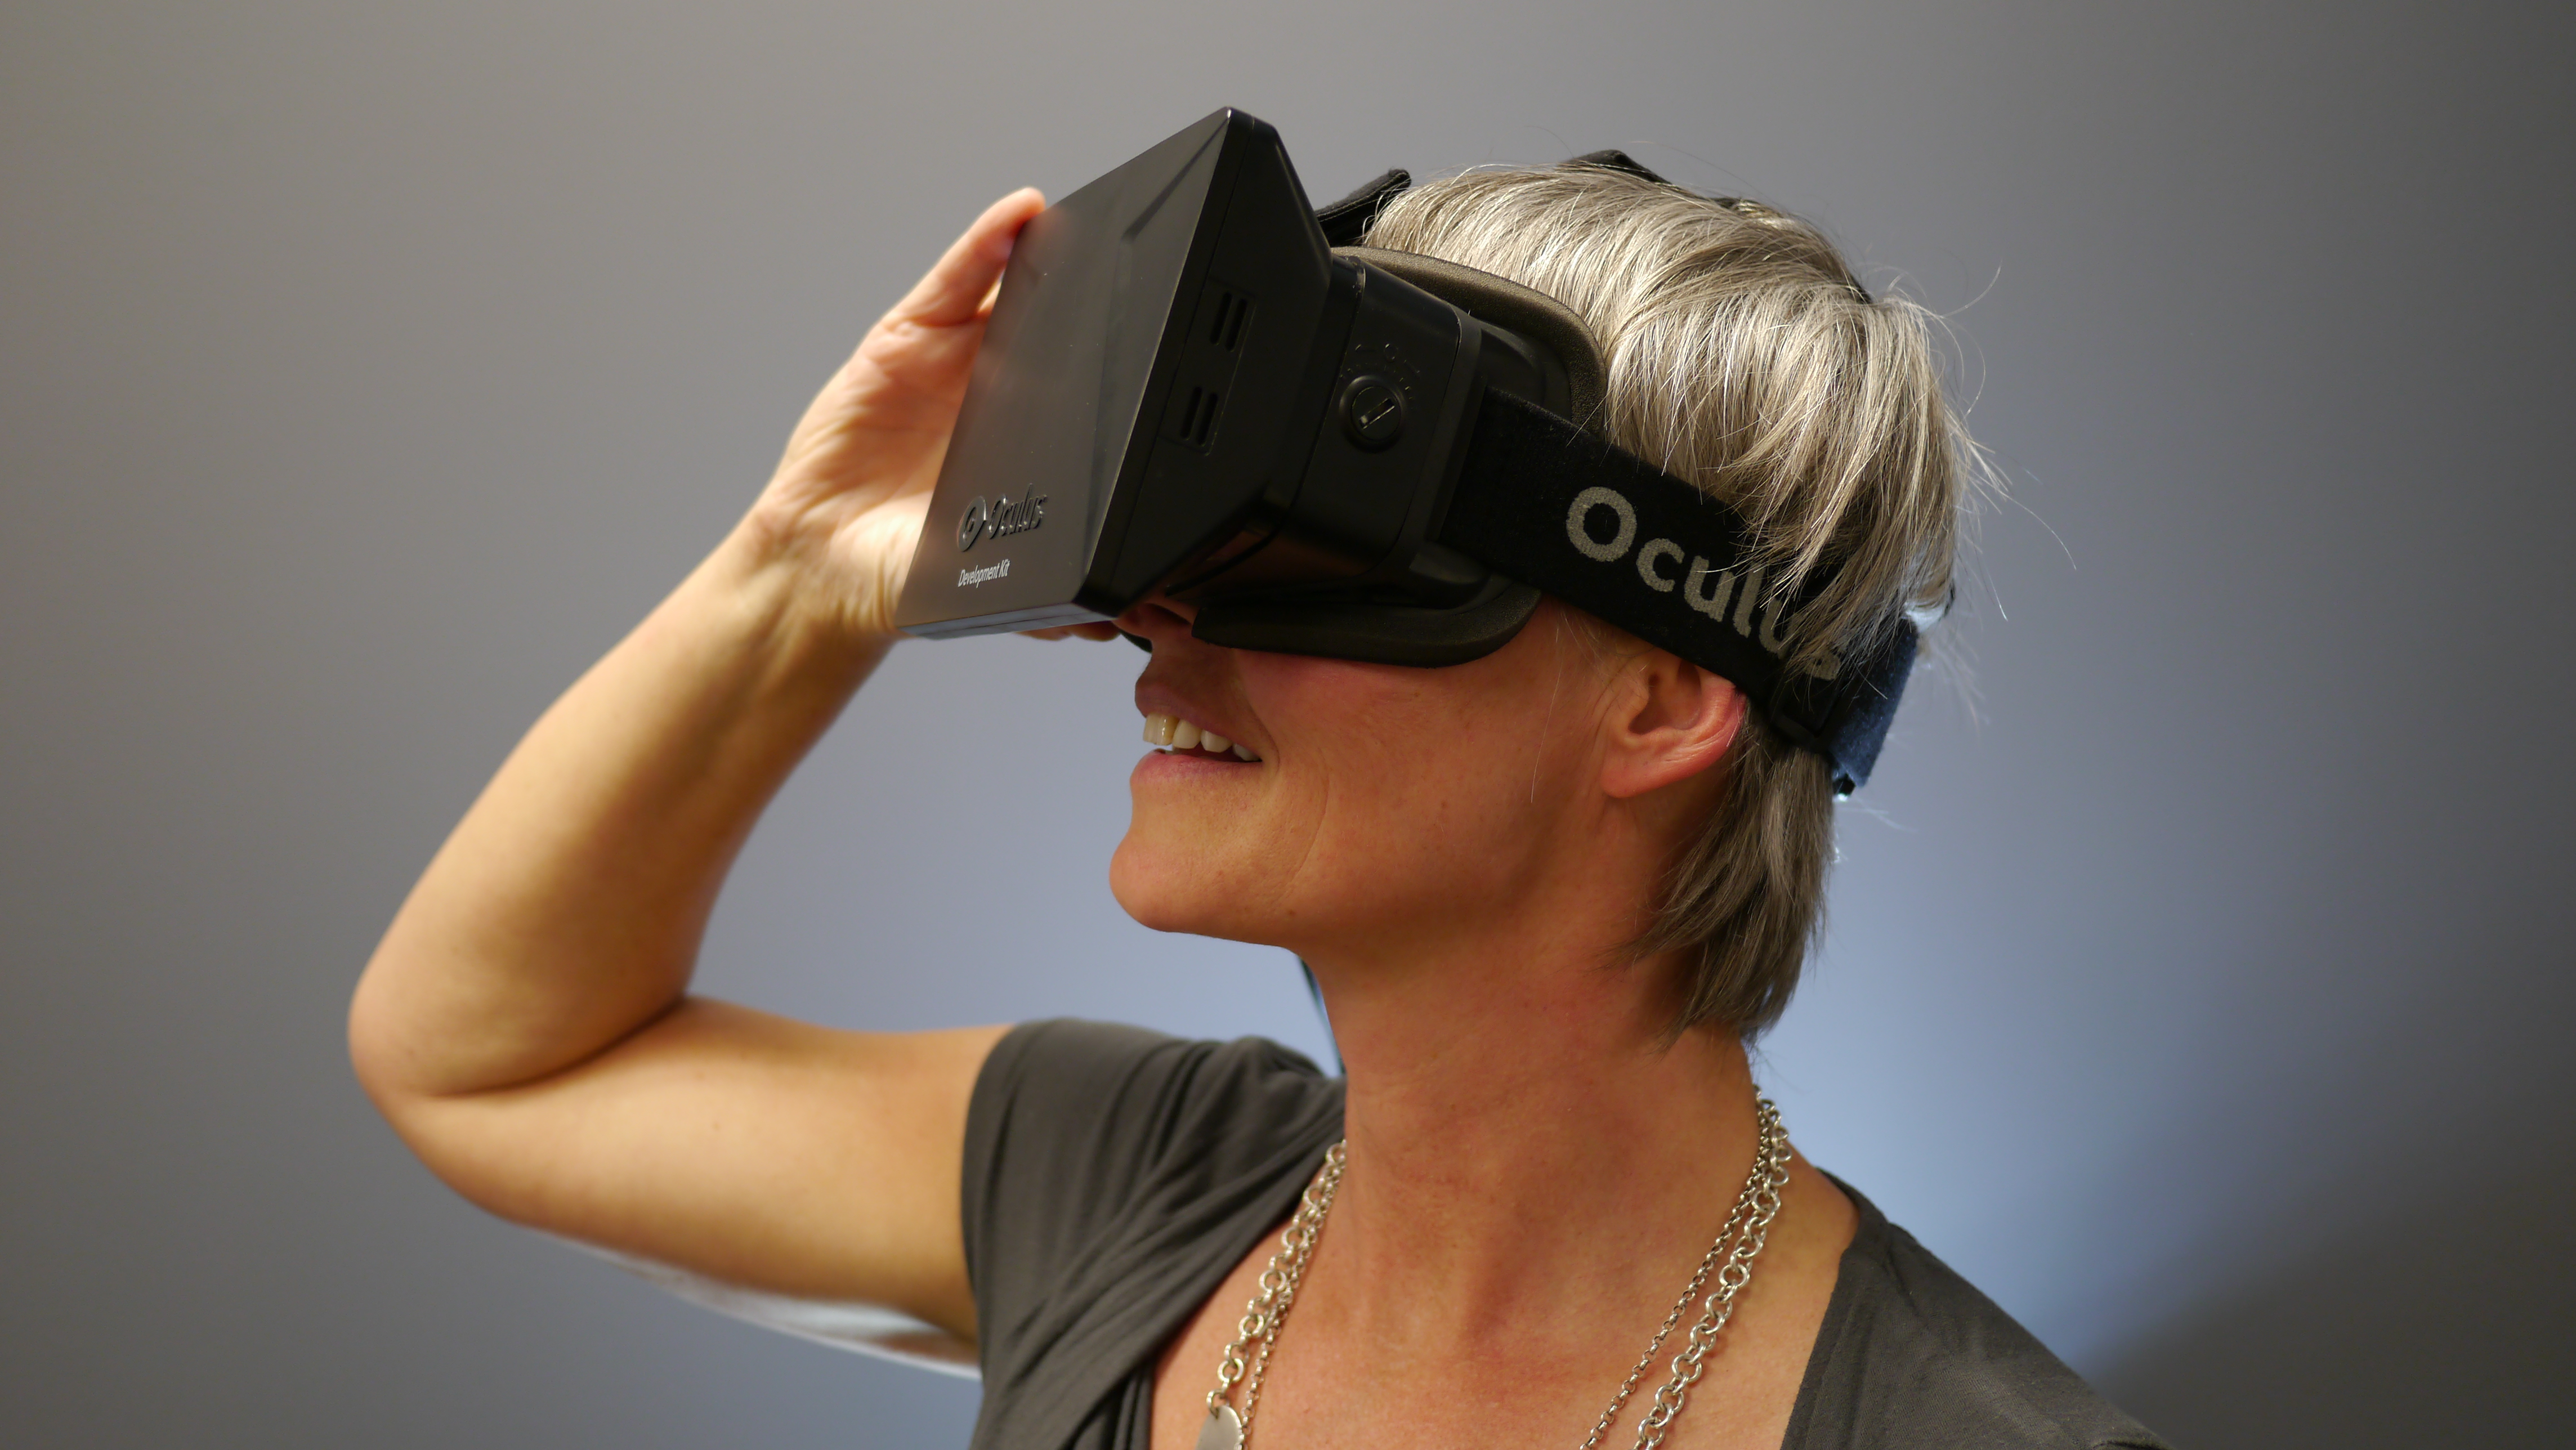 Jaunt uses the Oculus VR headset